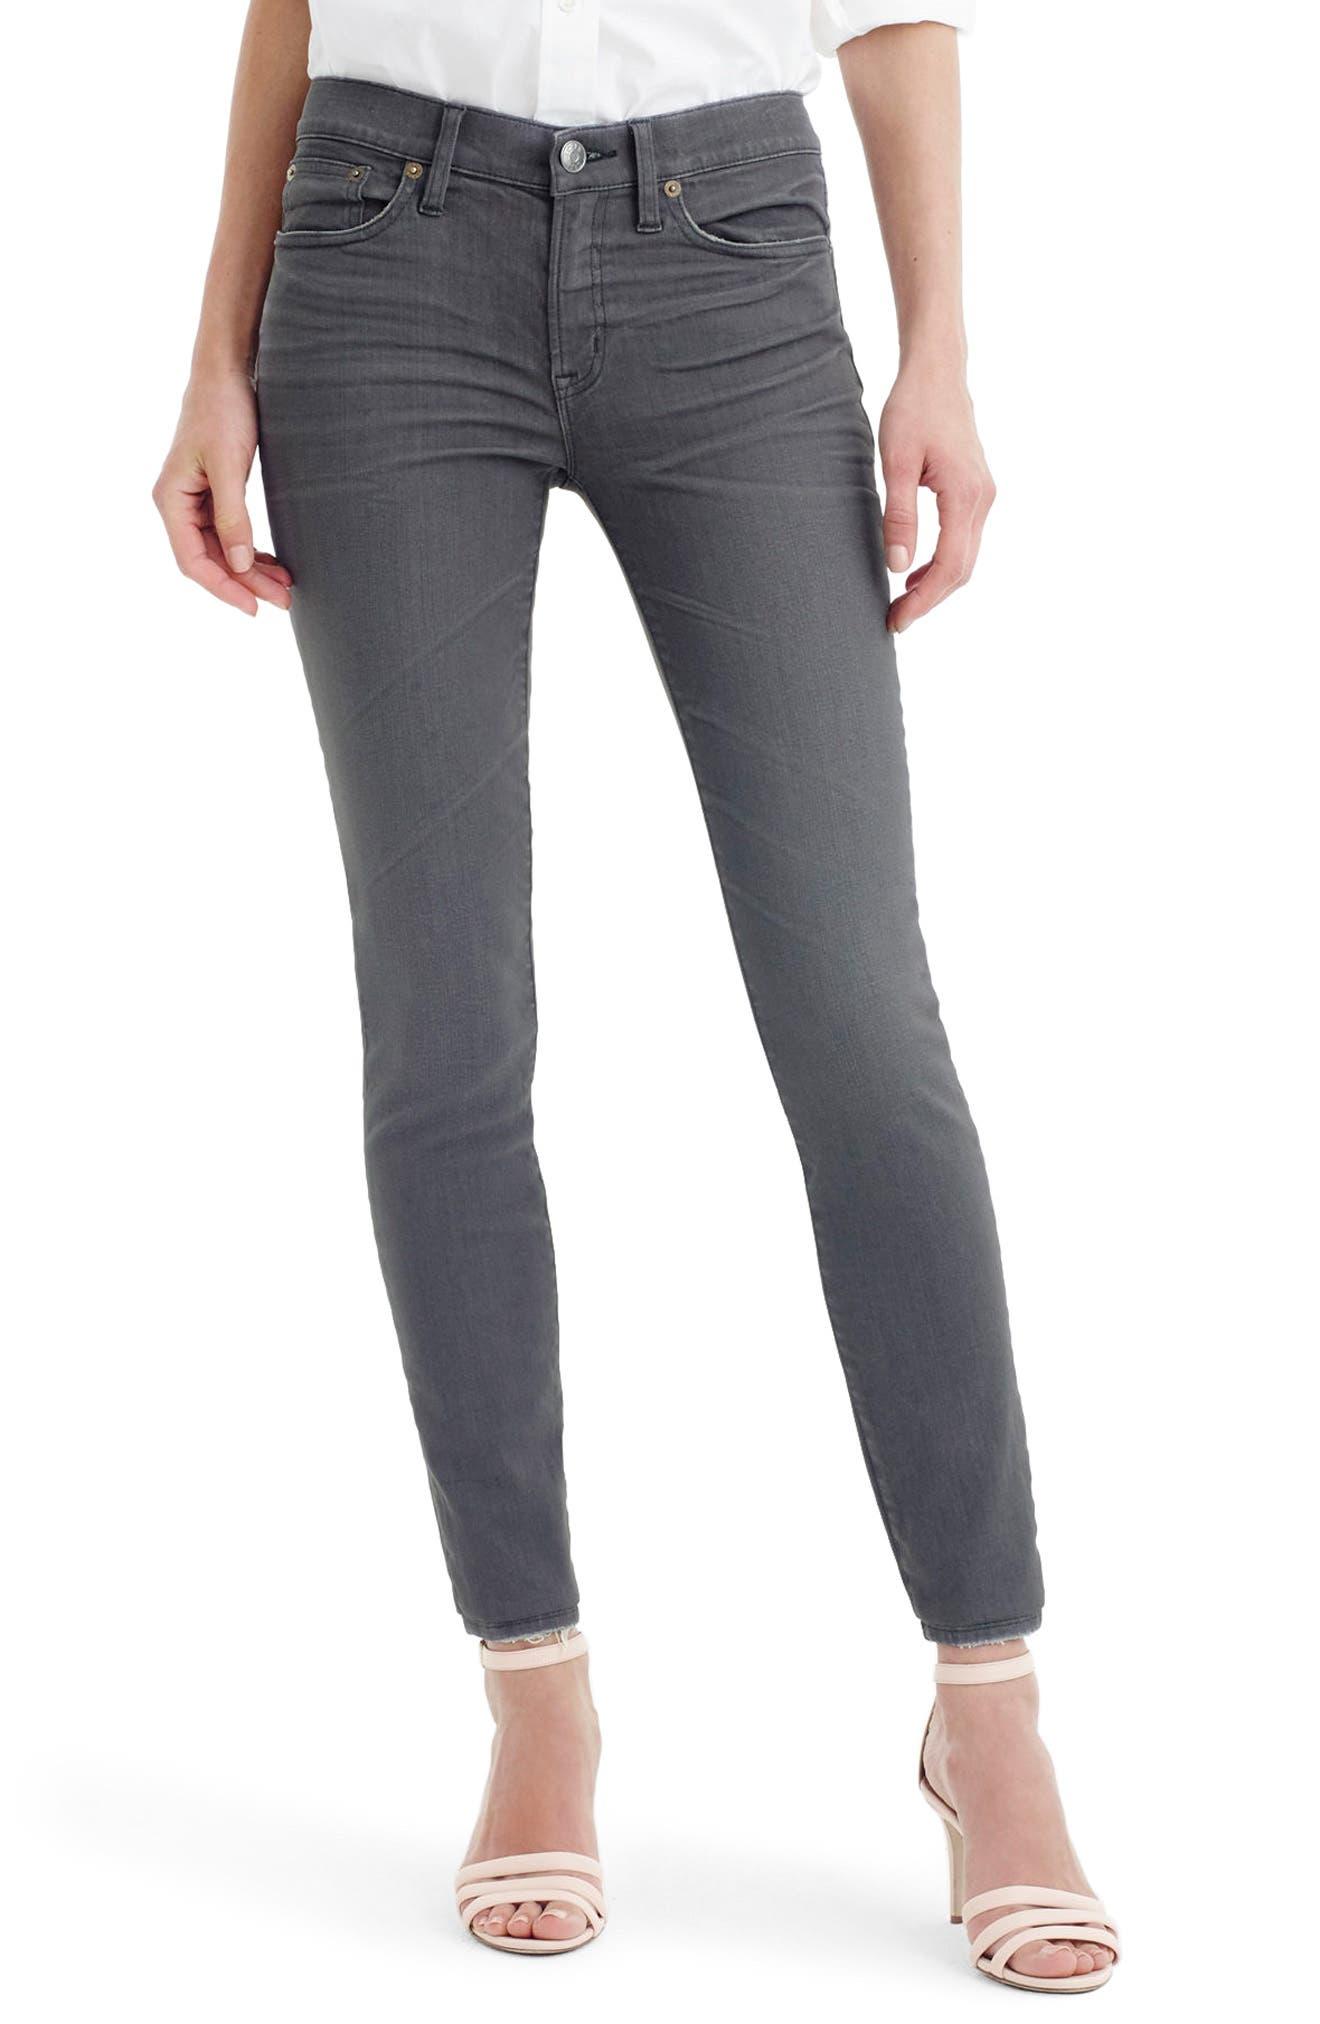 J.Crew Toothpick Jeans (Grey Dove) (Regular & Petite)